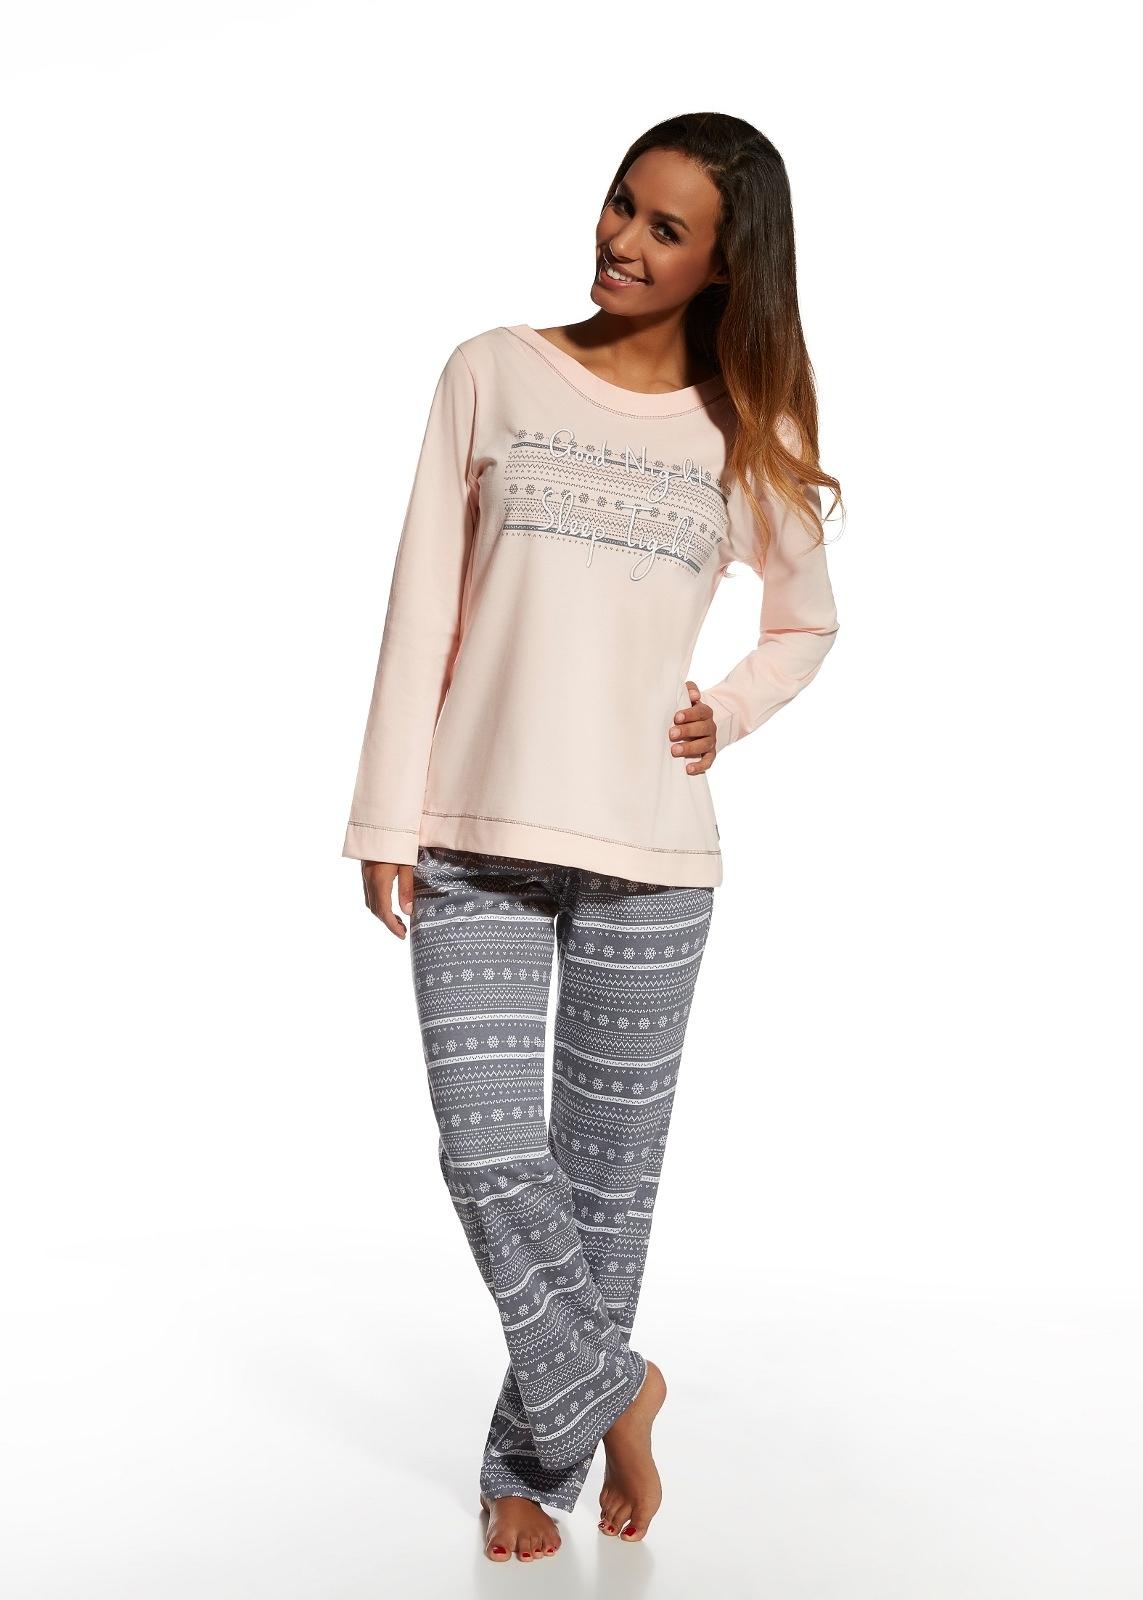 Dámské pyžamo Cornette 655/102 Stars - Růžová.šedá/XL